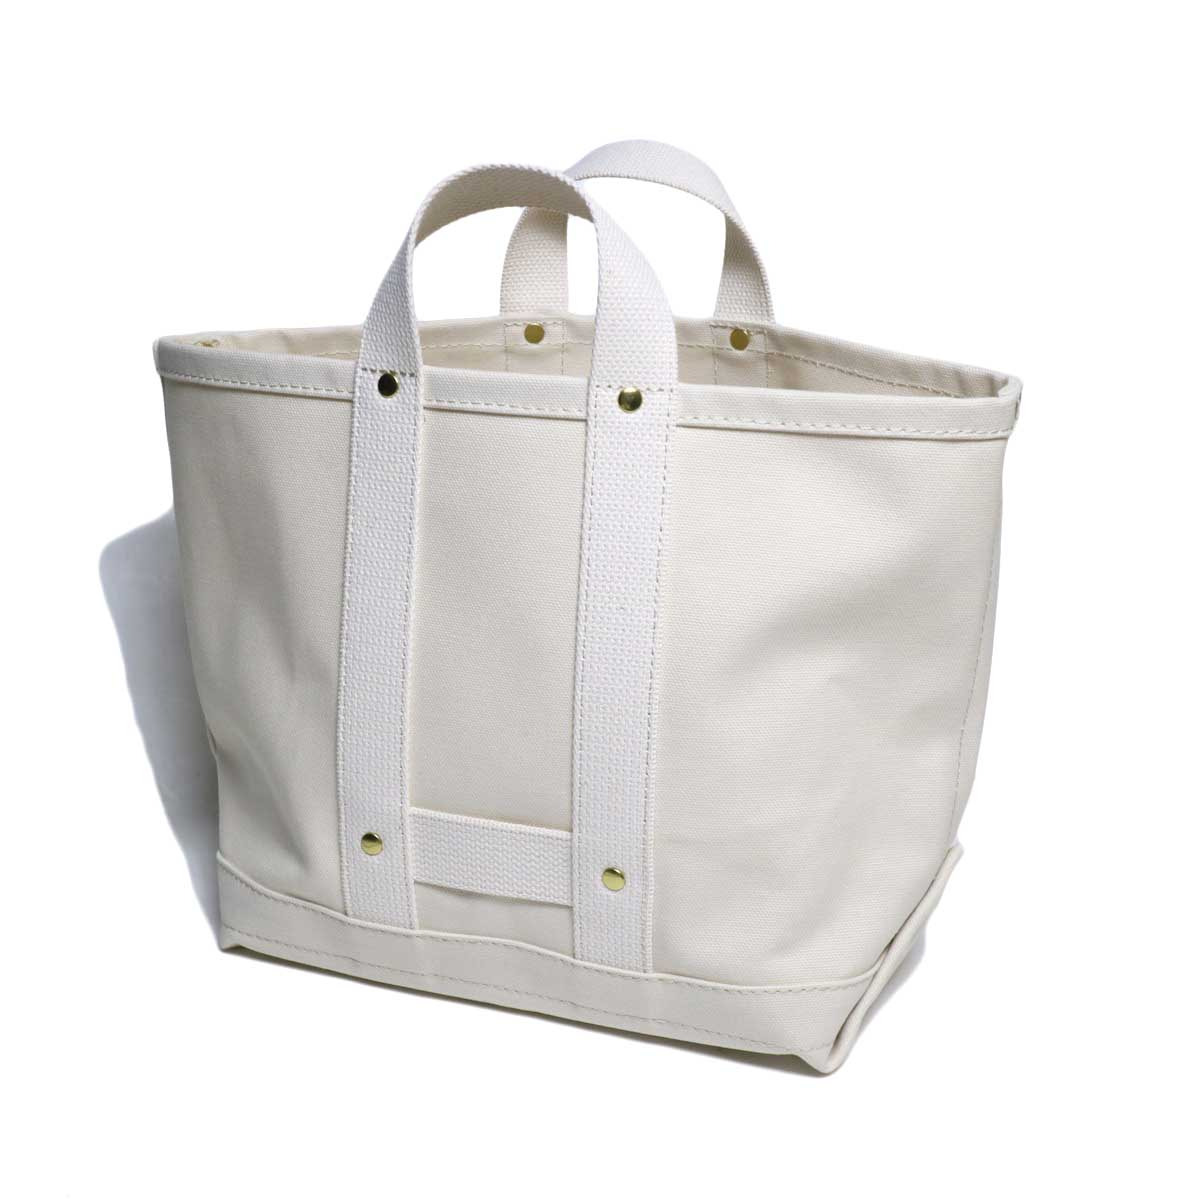 MASTER & Co. / RAILMAN BAG (White S) 斜め